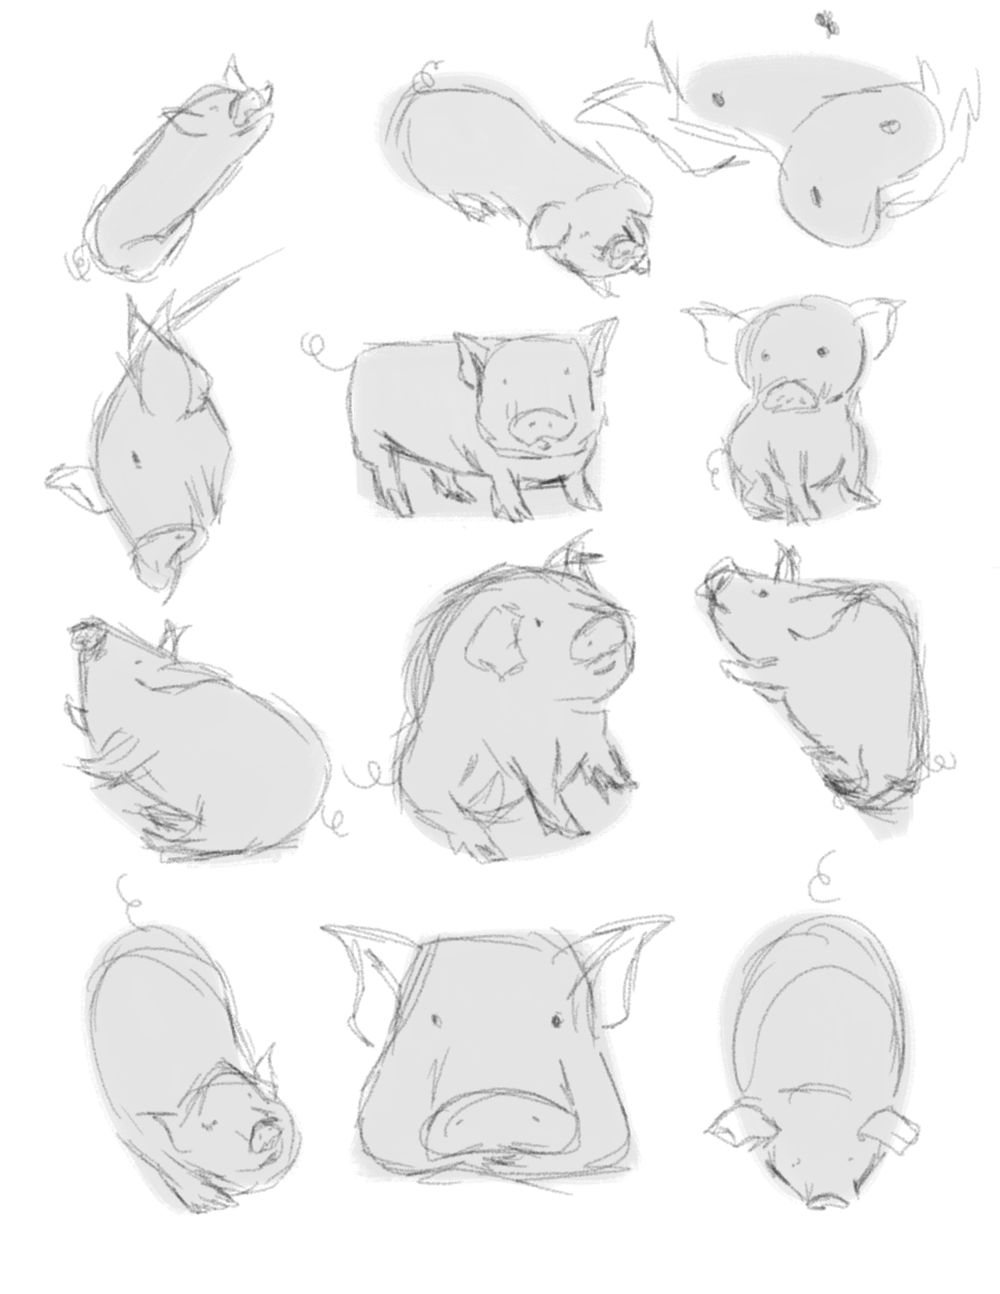 Piggy<3 - image 3 - student project